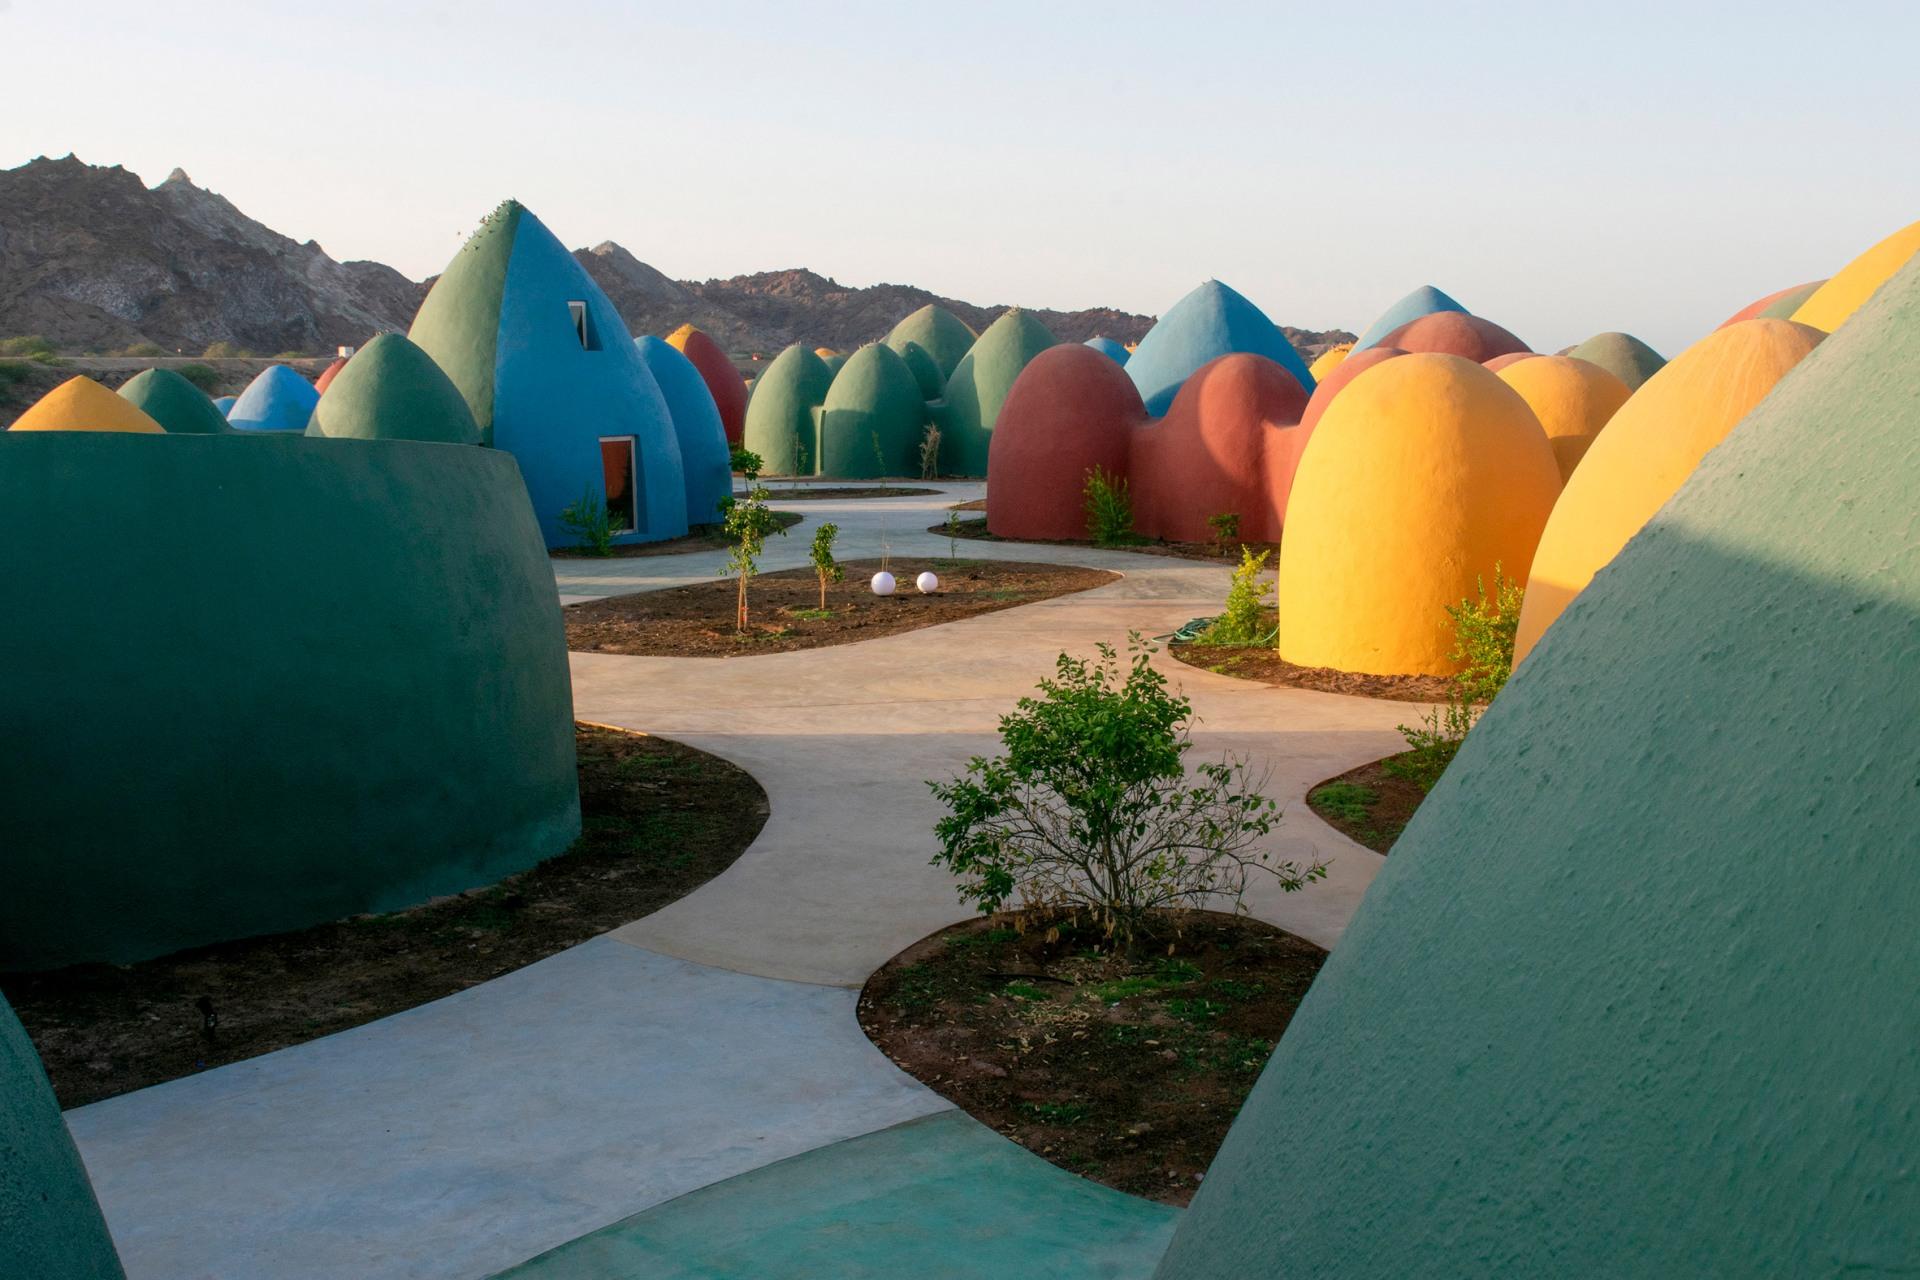 zav_architects_iran_hormuz_island_designalive-1